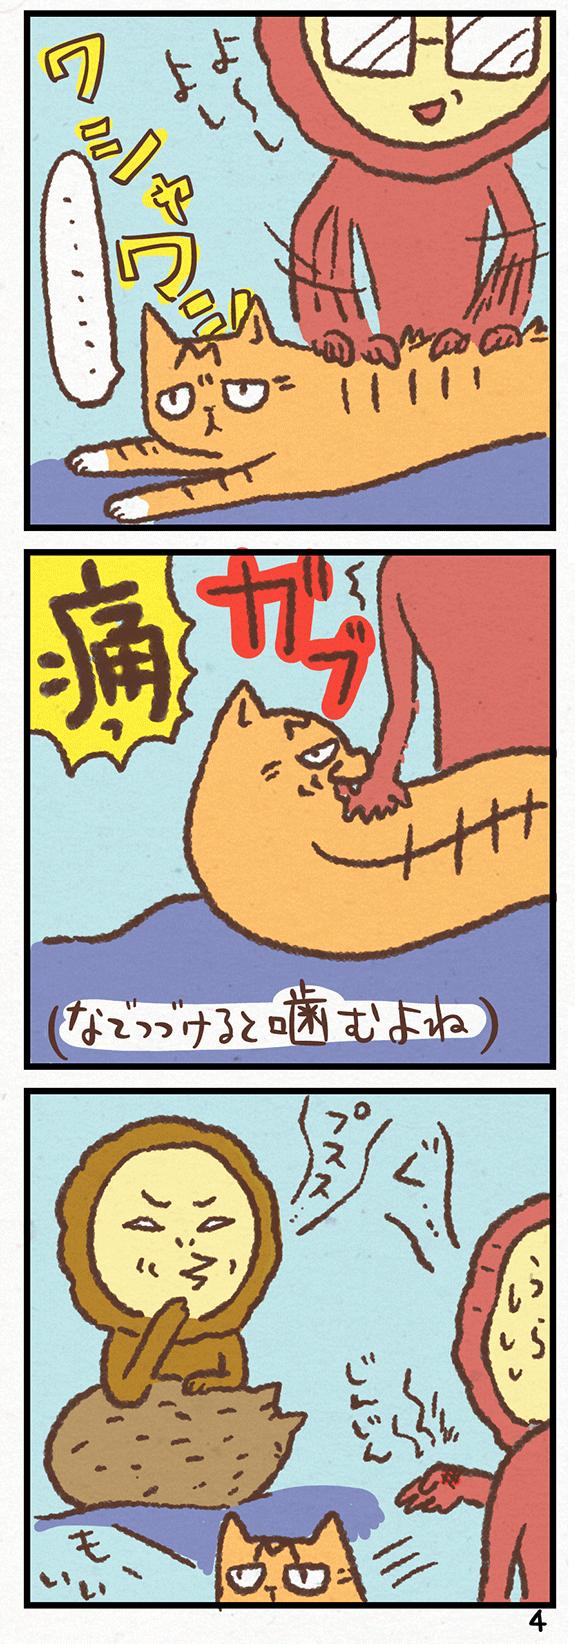 ibib2304